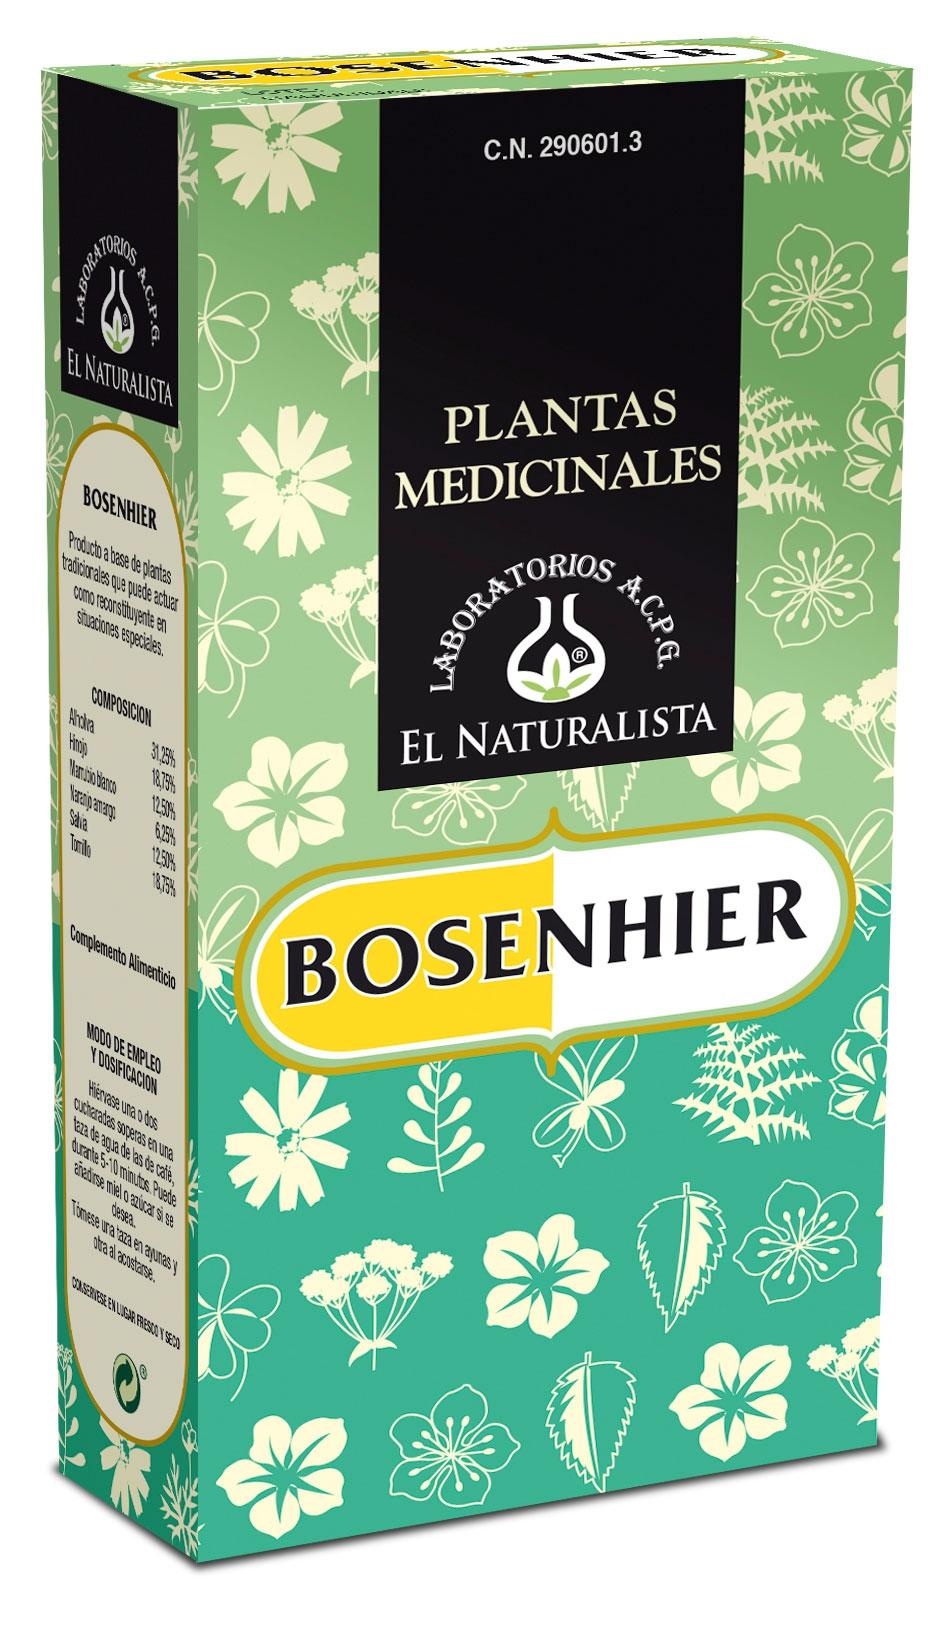 El Naturalista Bosenhier 100gr